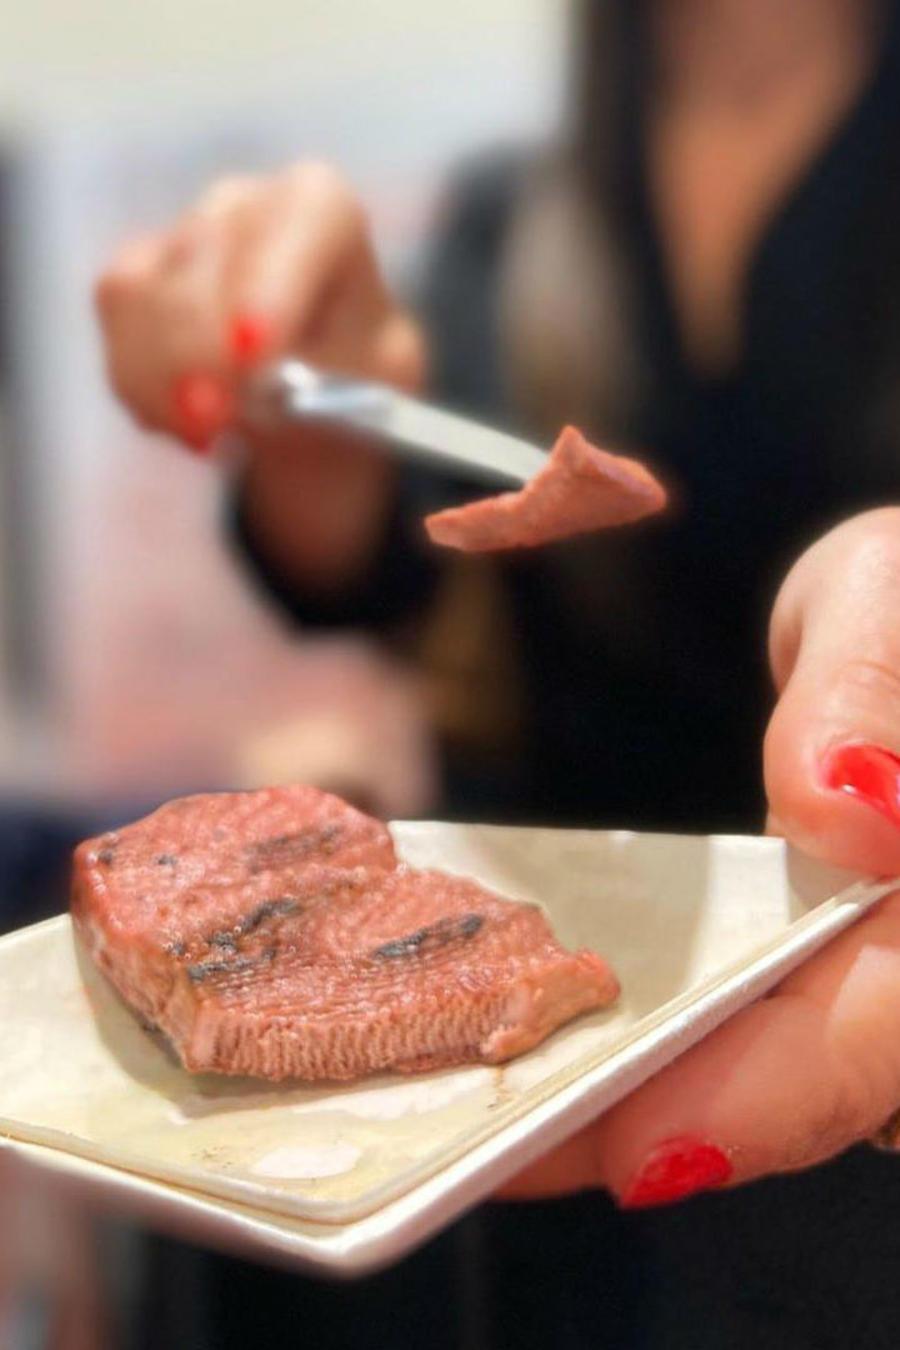 Carne hecha en impresora 3D